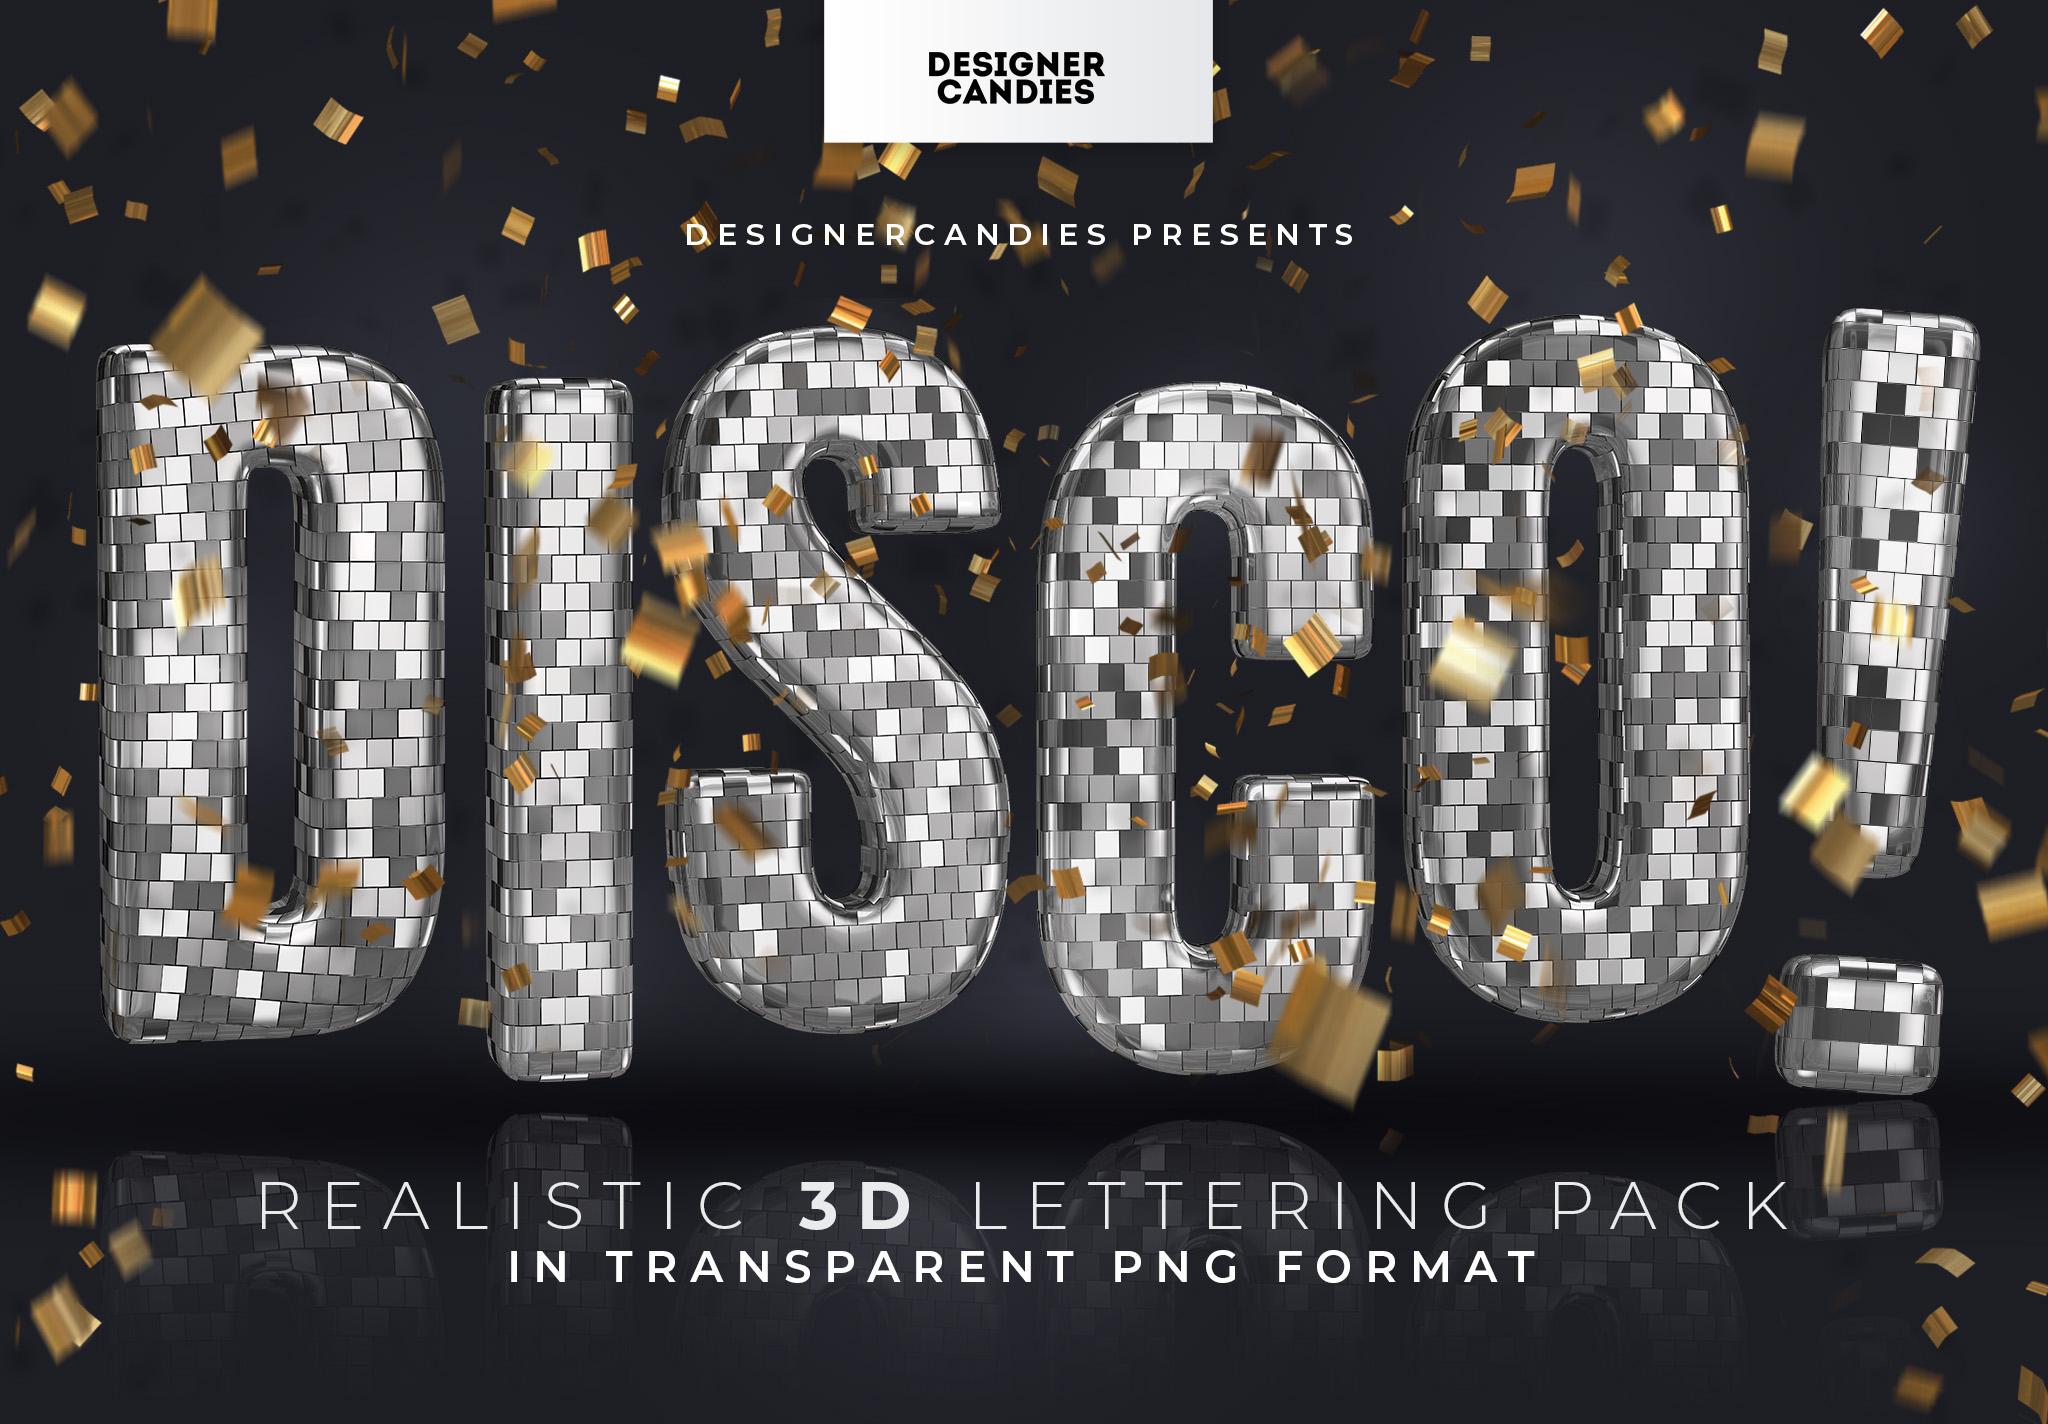 Disco Ball 3D Lettering Pack